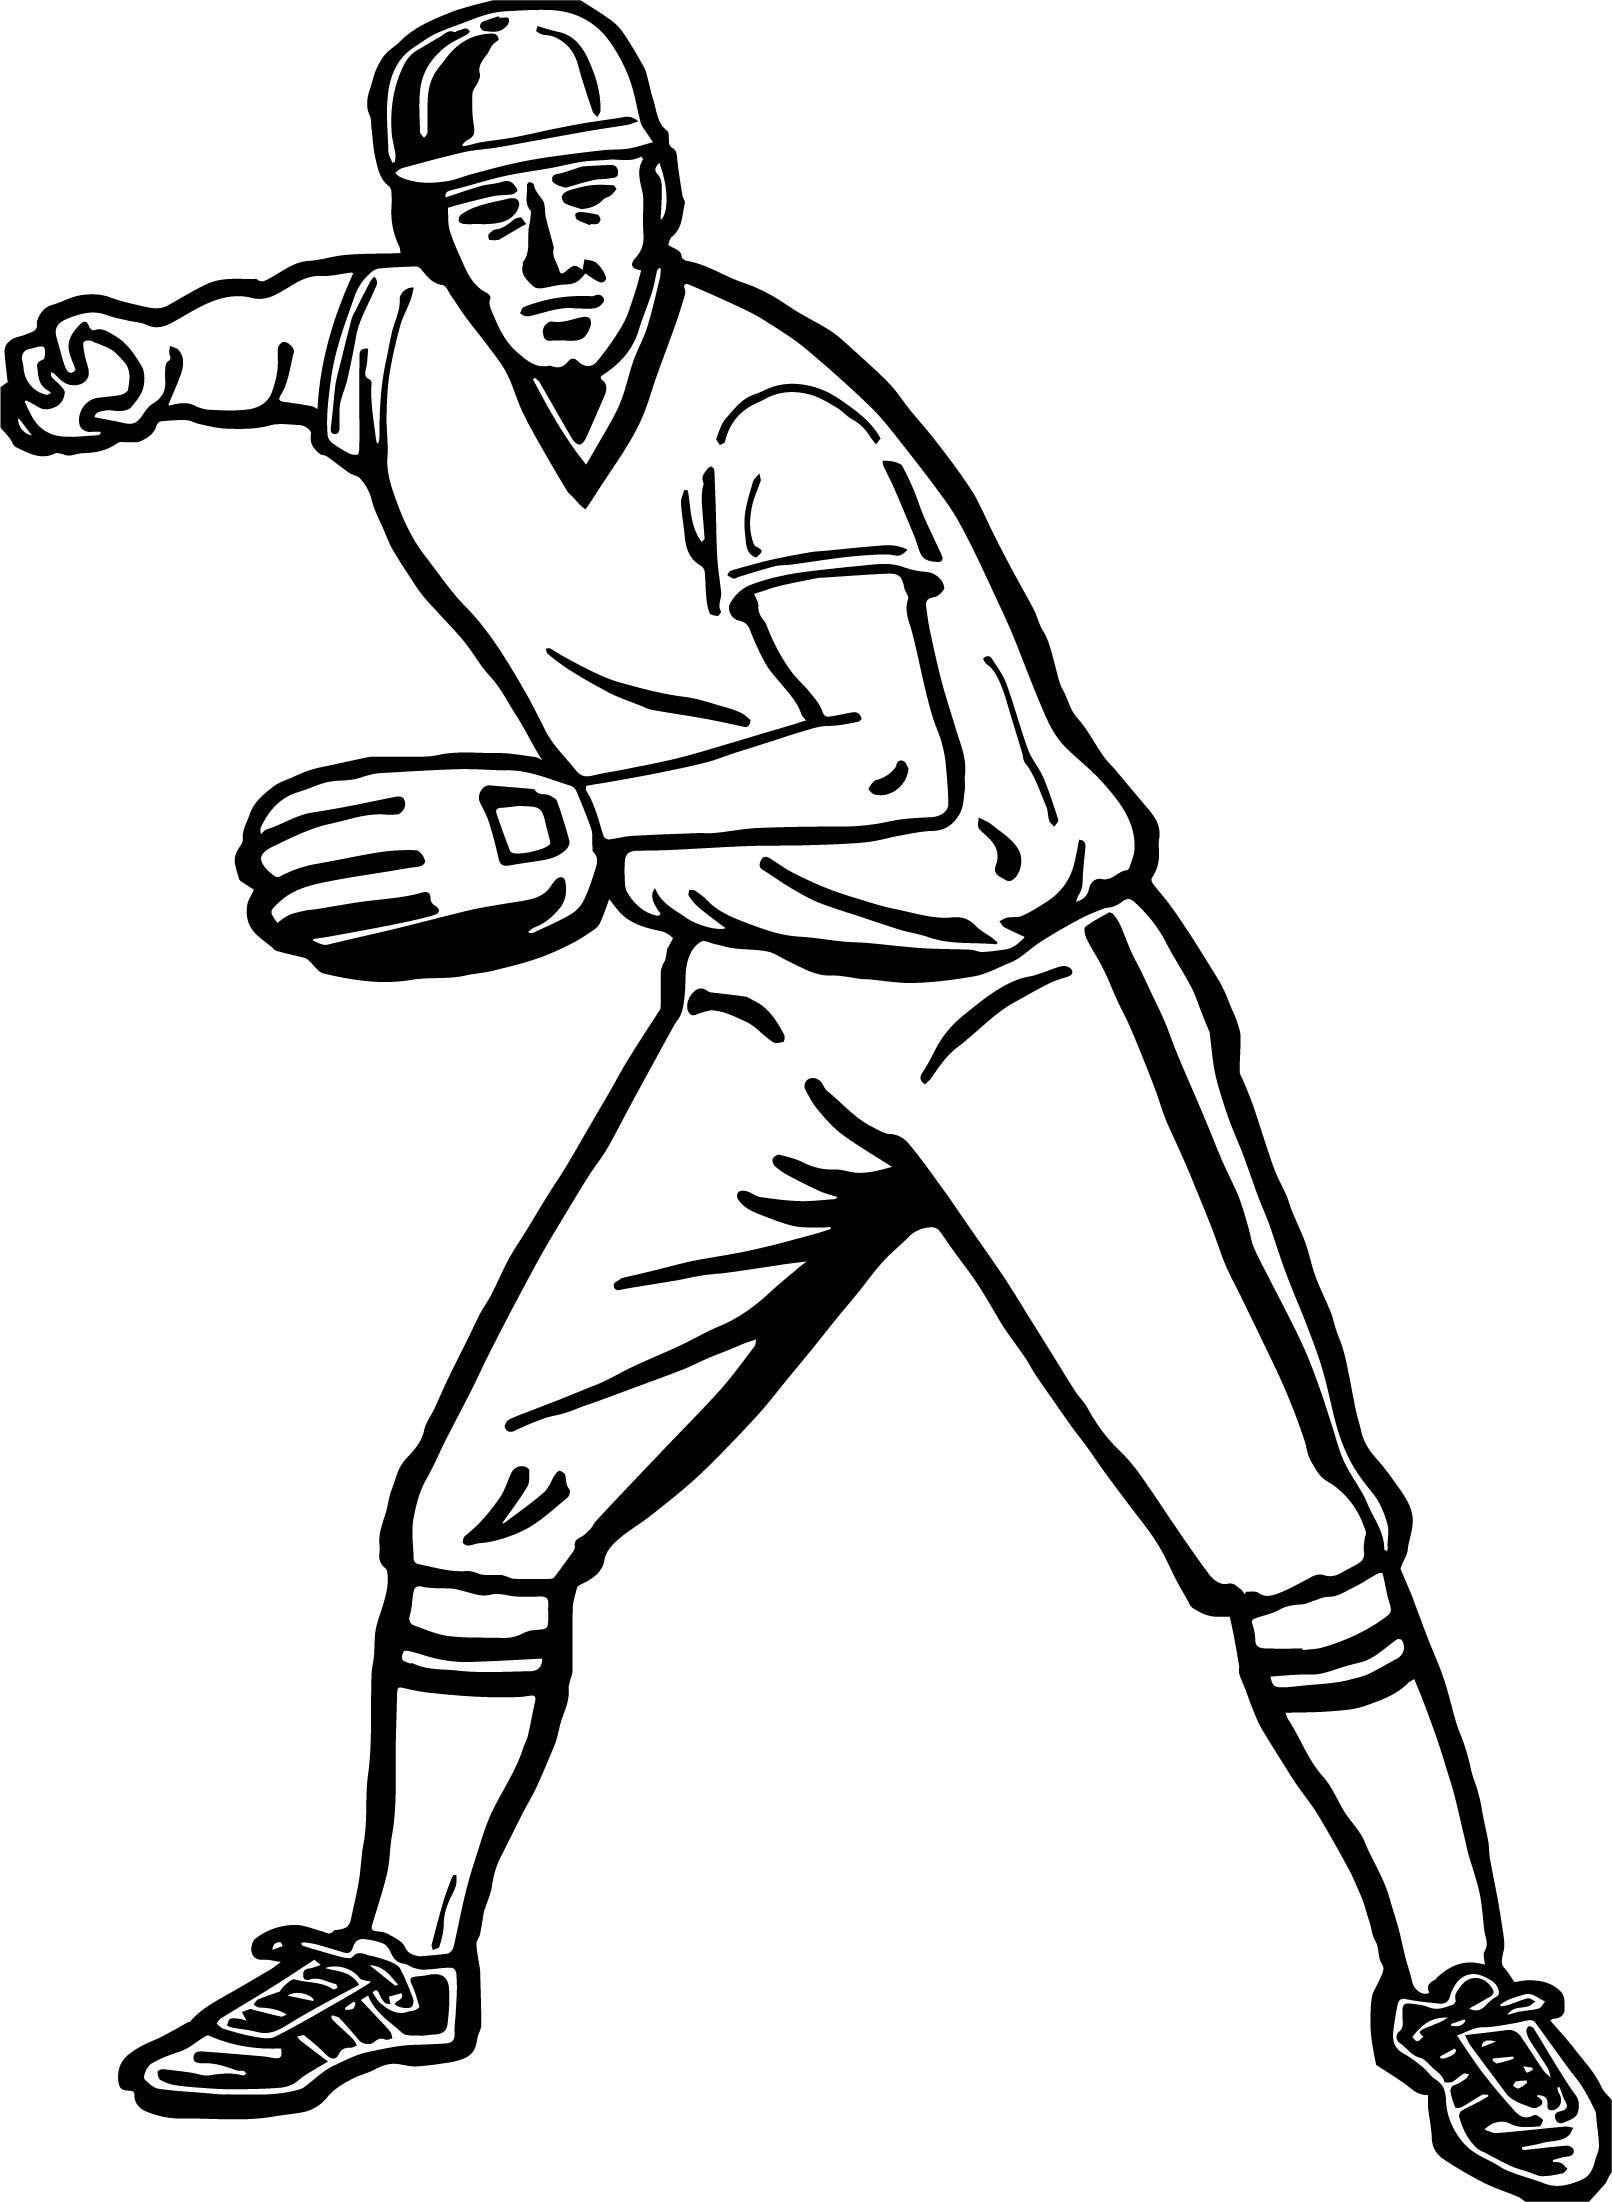 cool Throw Baseball Coloring Page Baseball coloring